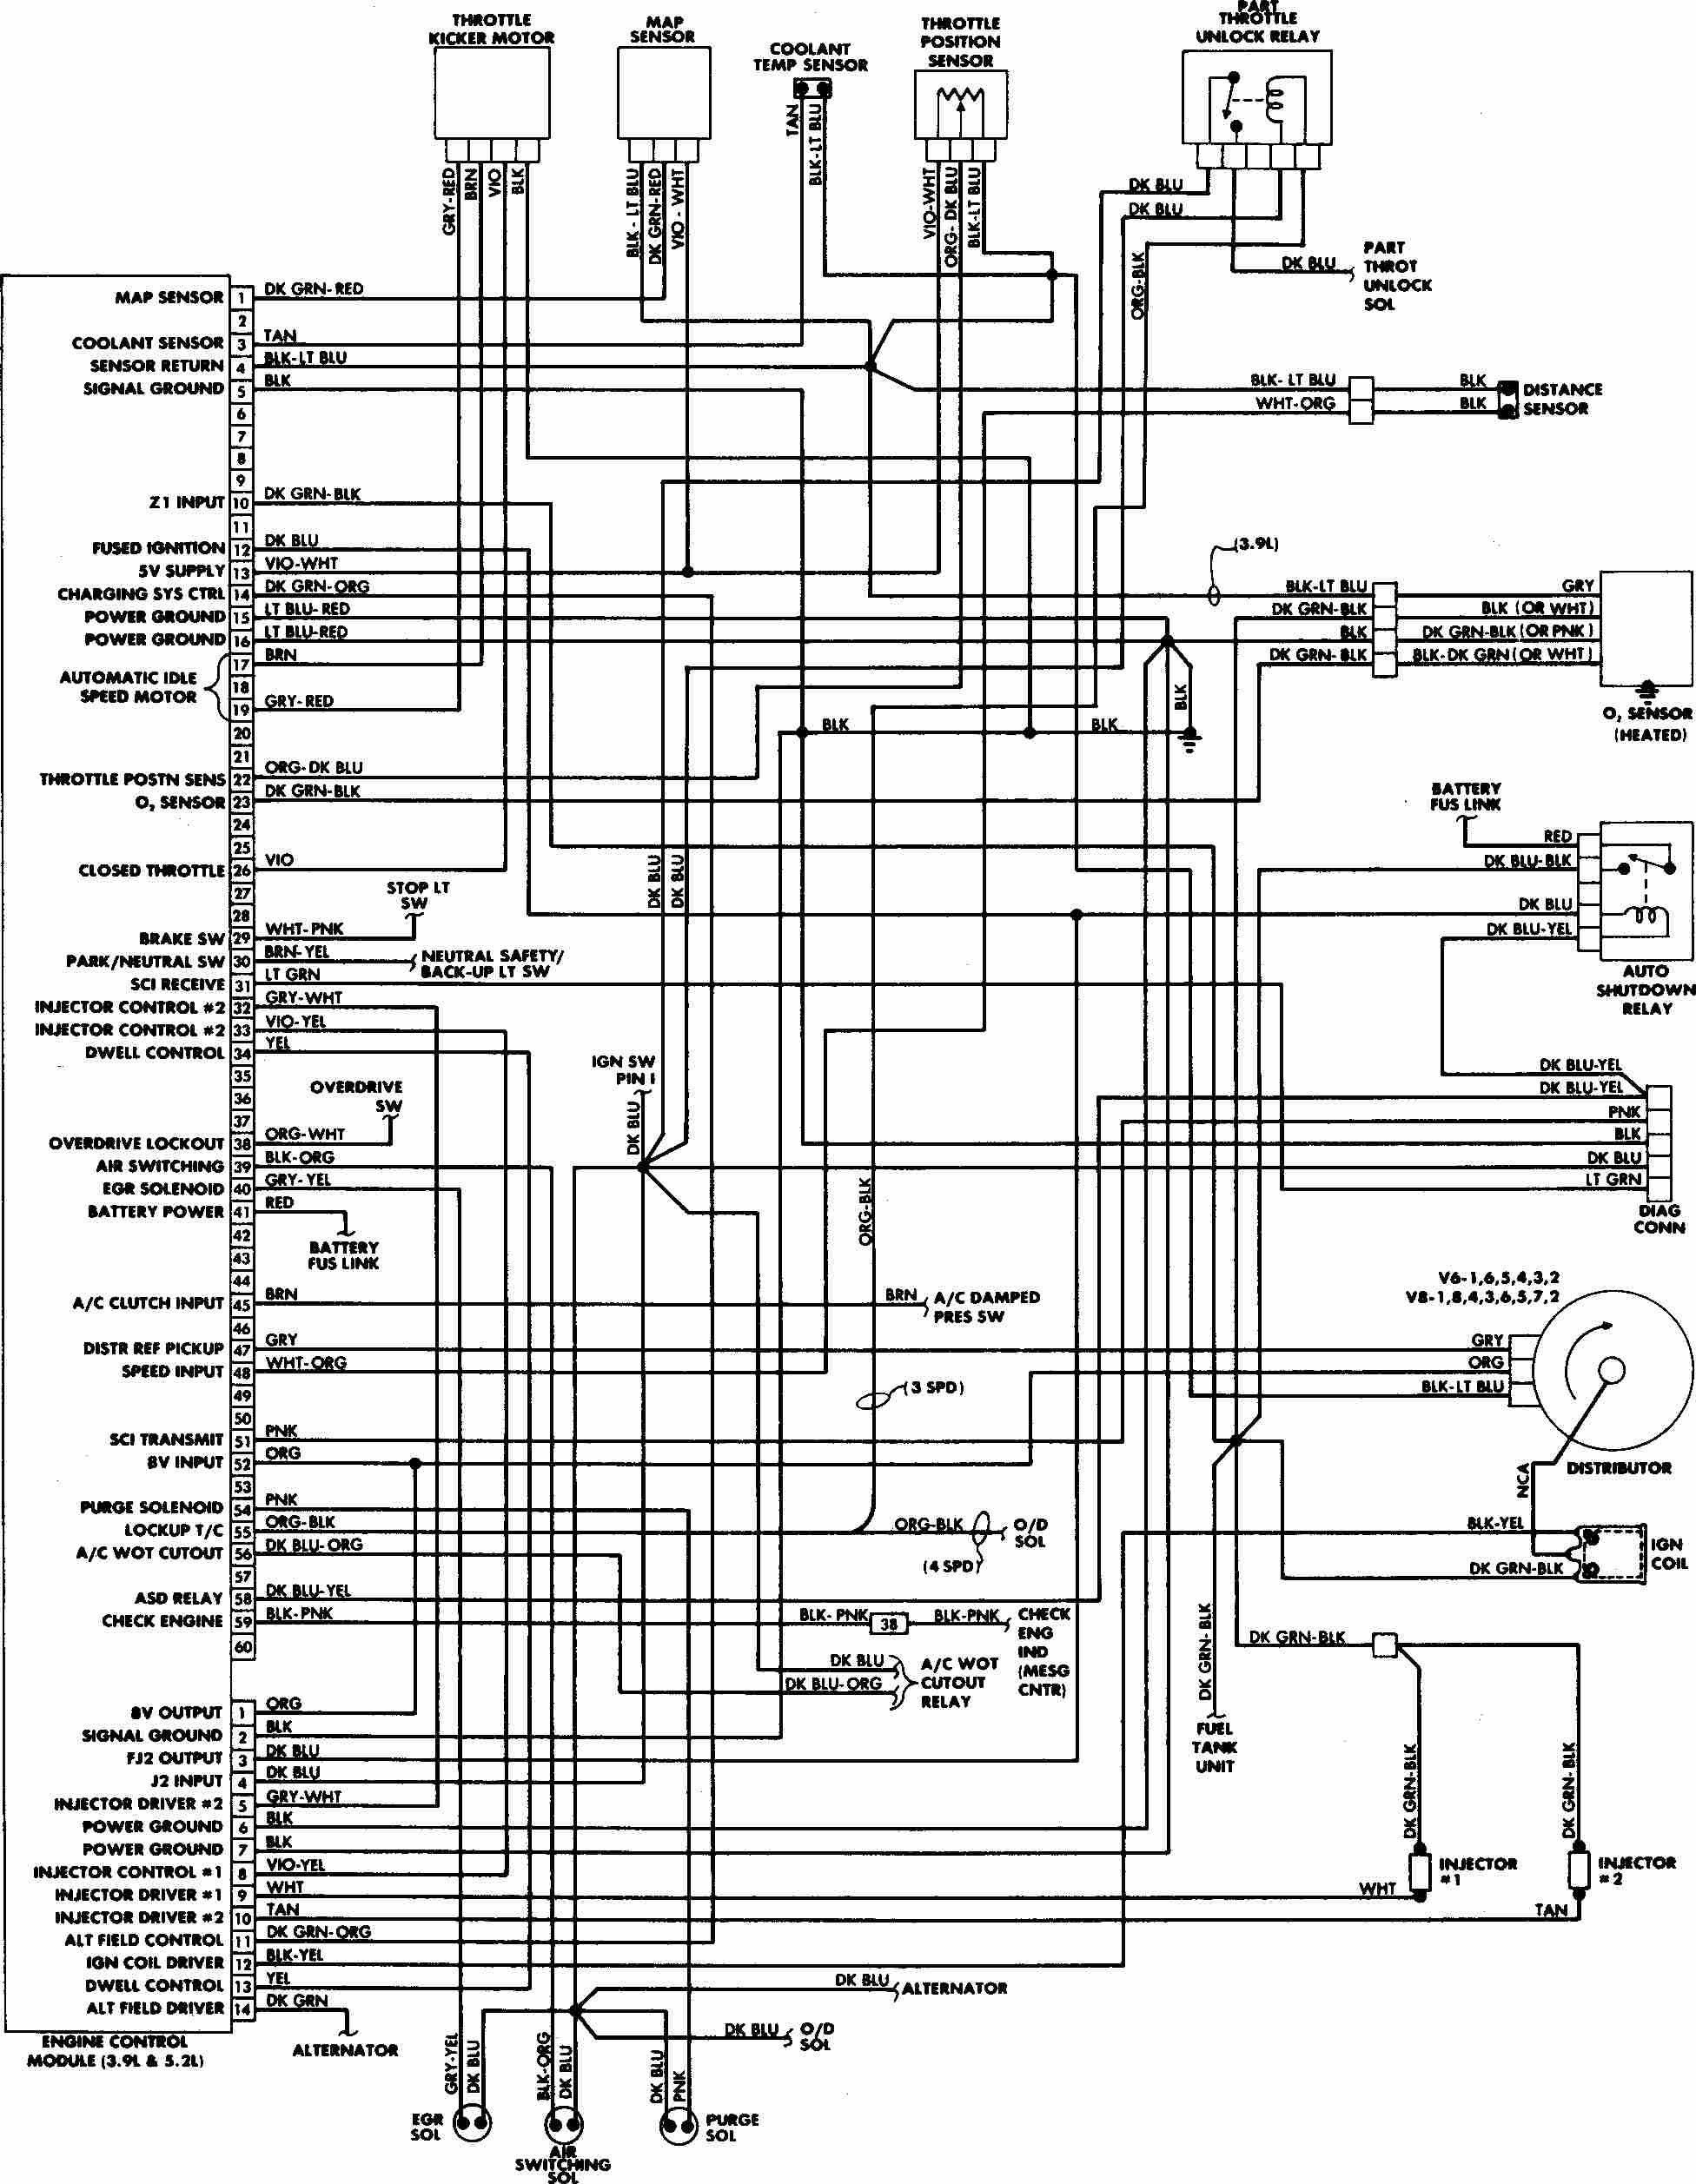 30 Unique Dodge Neon Starter Wiring Diagram Dodge Durango Dodge Electrical Diagram